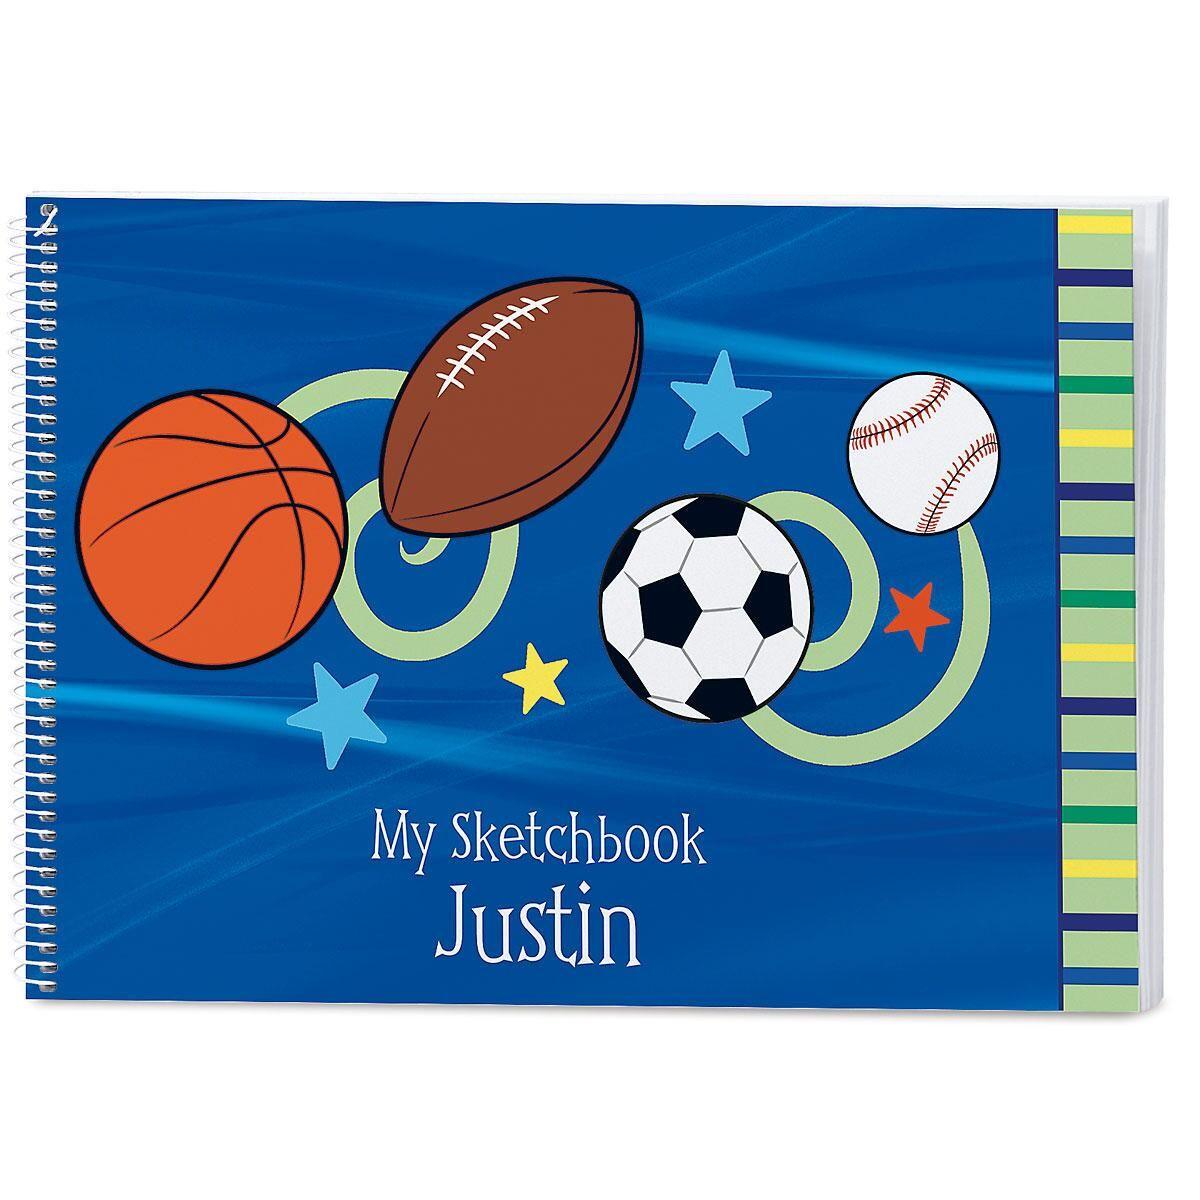 Sportsballs Sketchbook